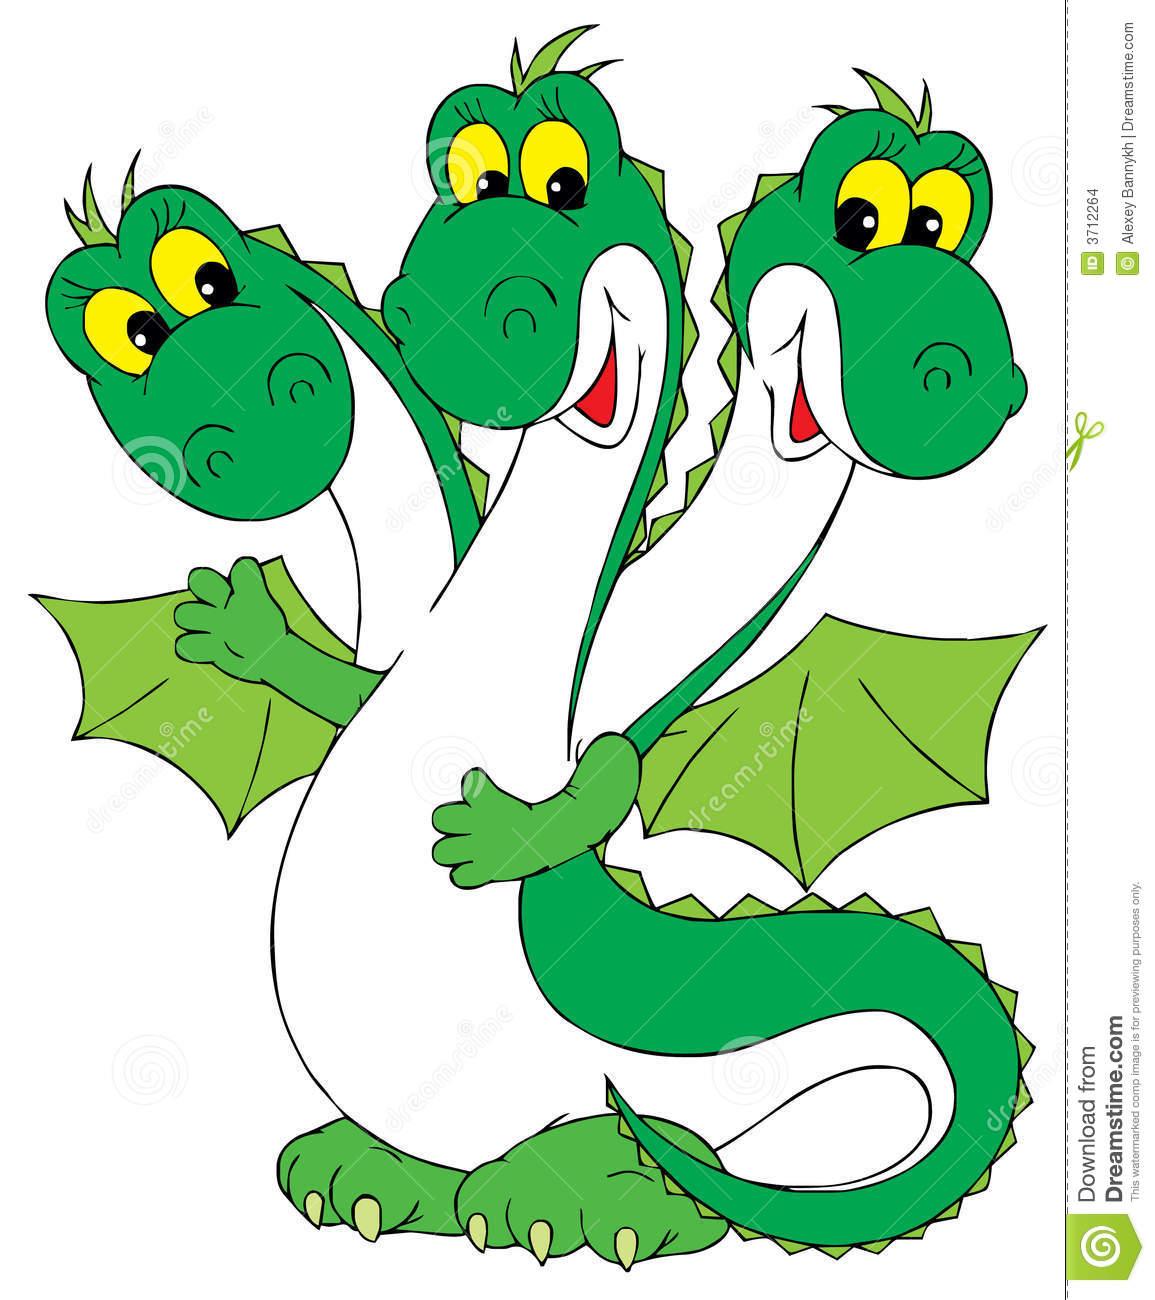 Dragon Clip Art Images Free